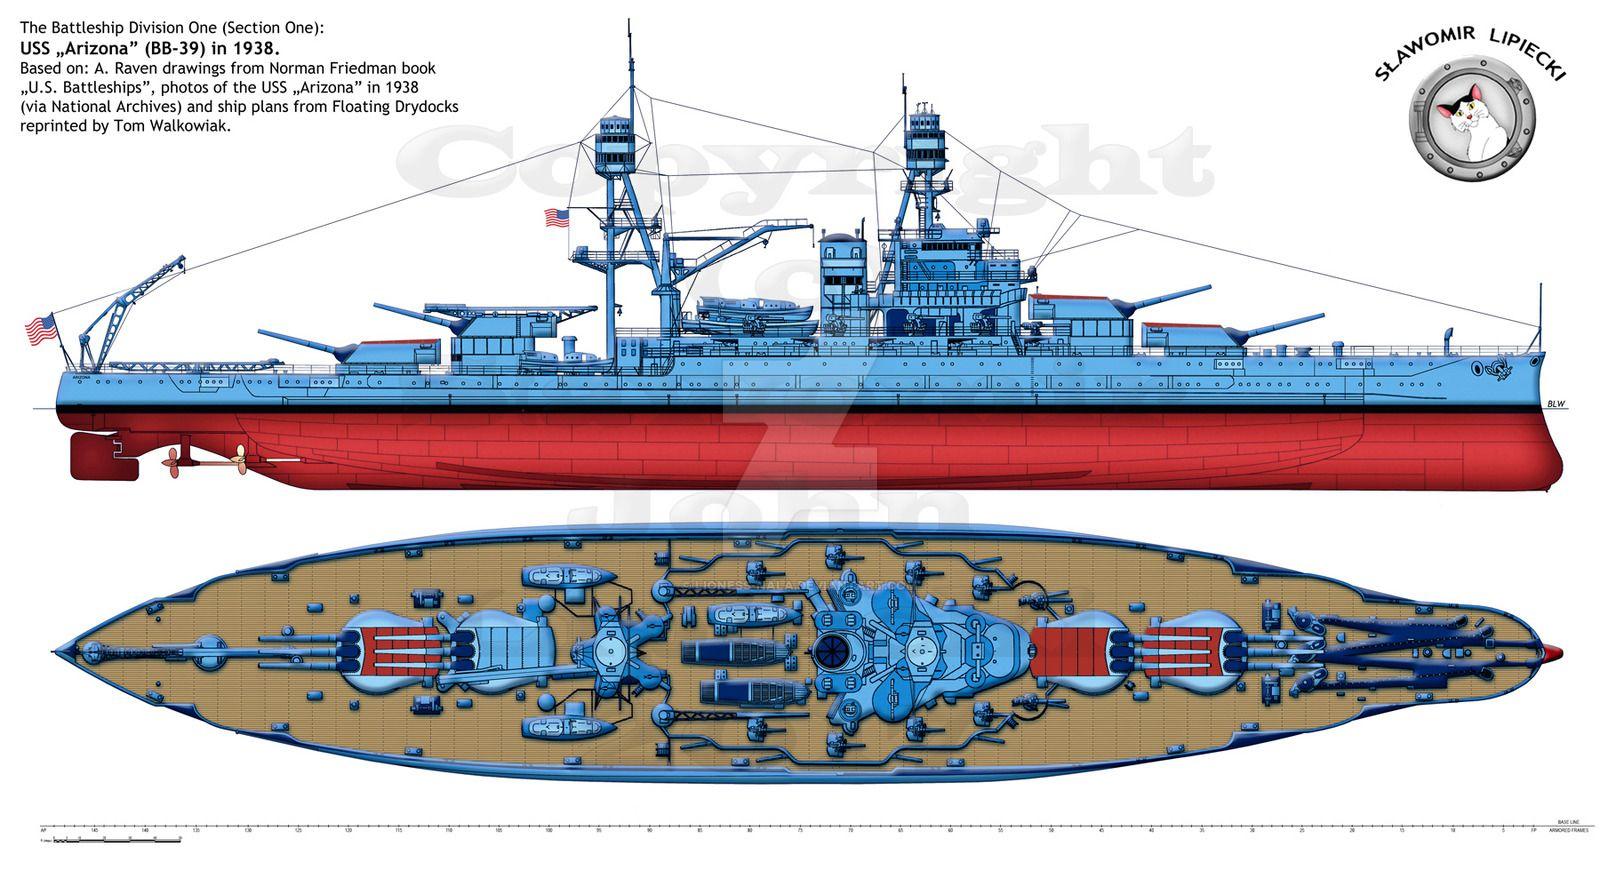 US Naval Battleship Photo Print USN Navy USS ARIZONA BB 39